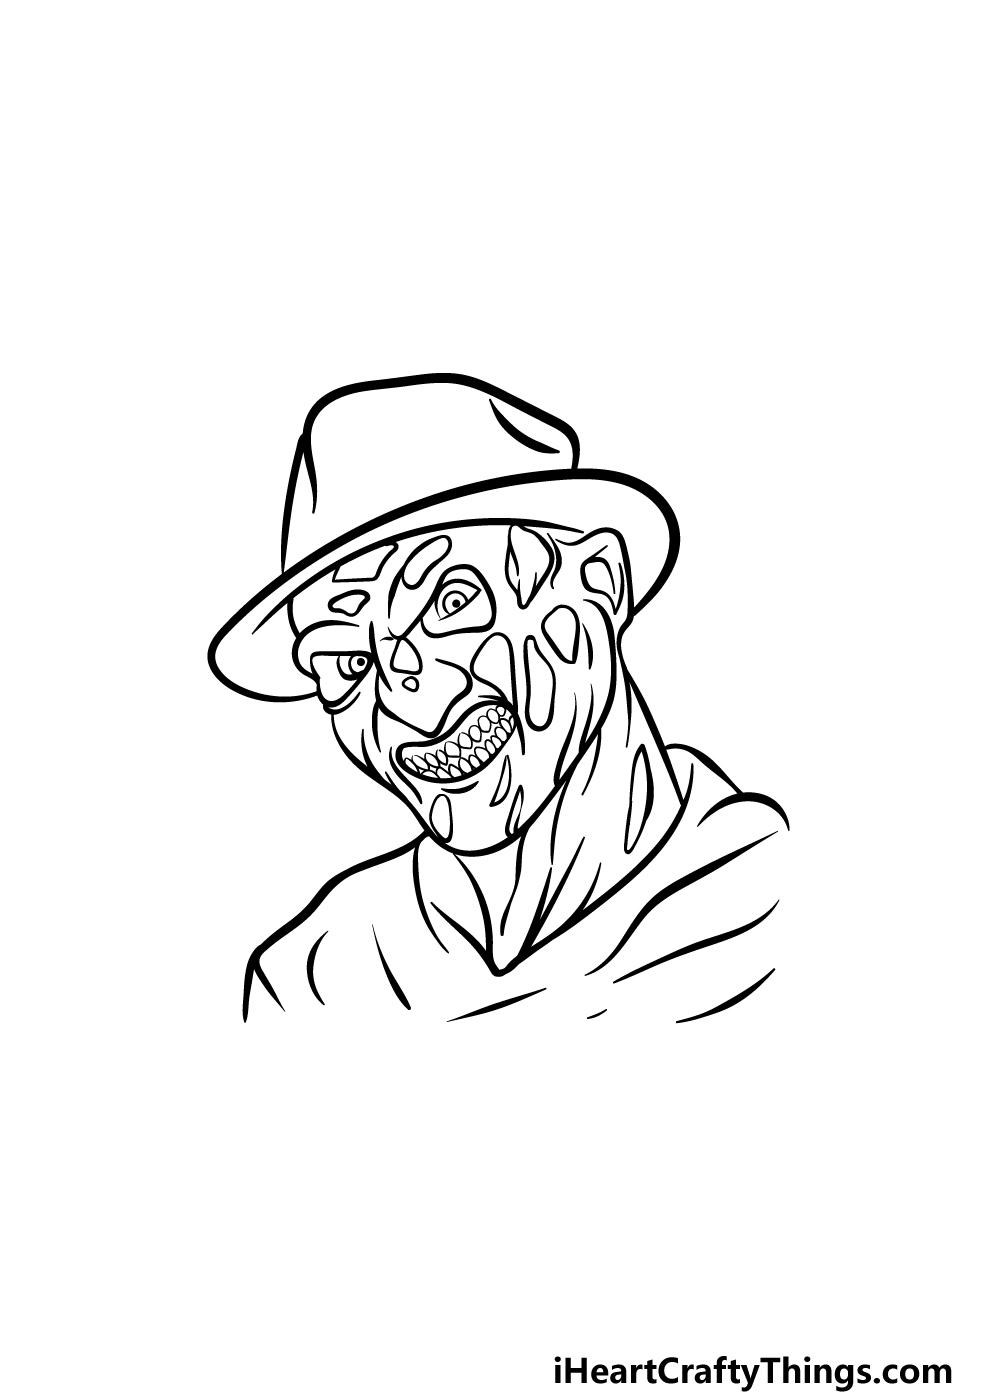 Drawing Freddy Krueger step 4